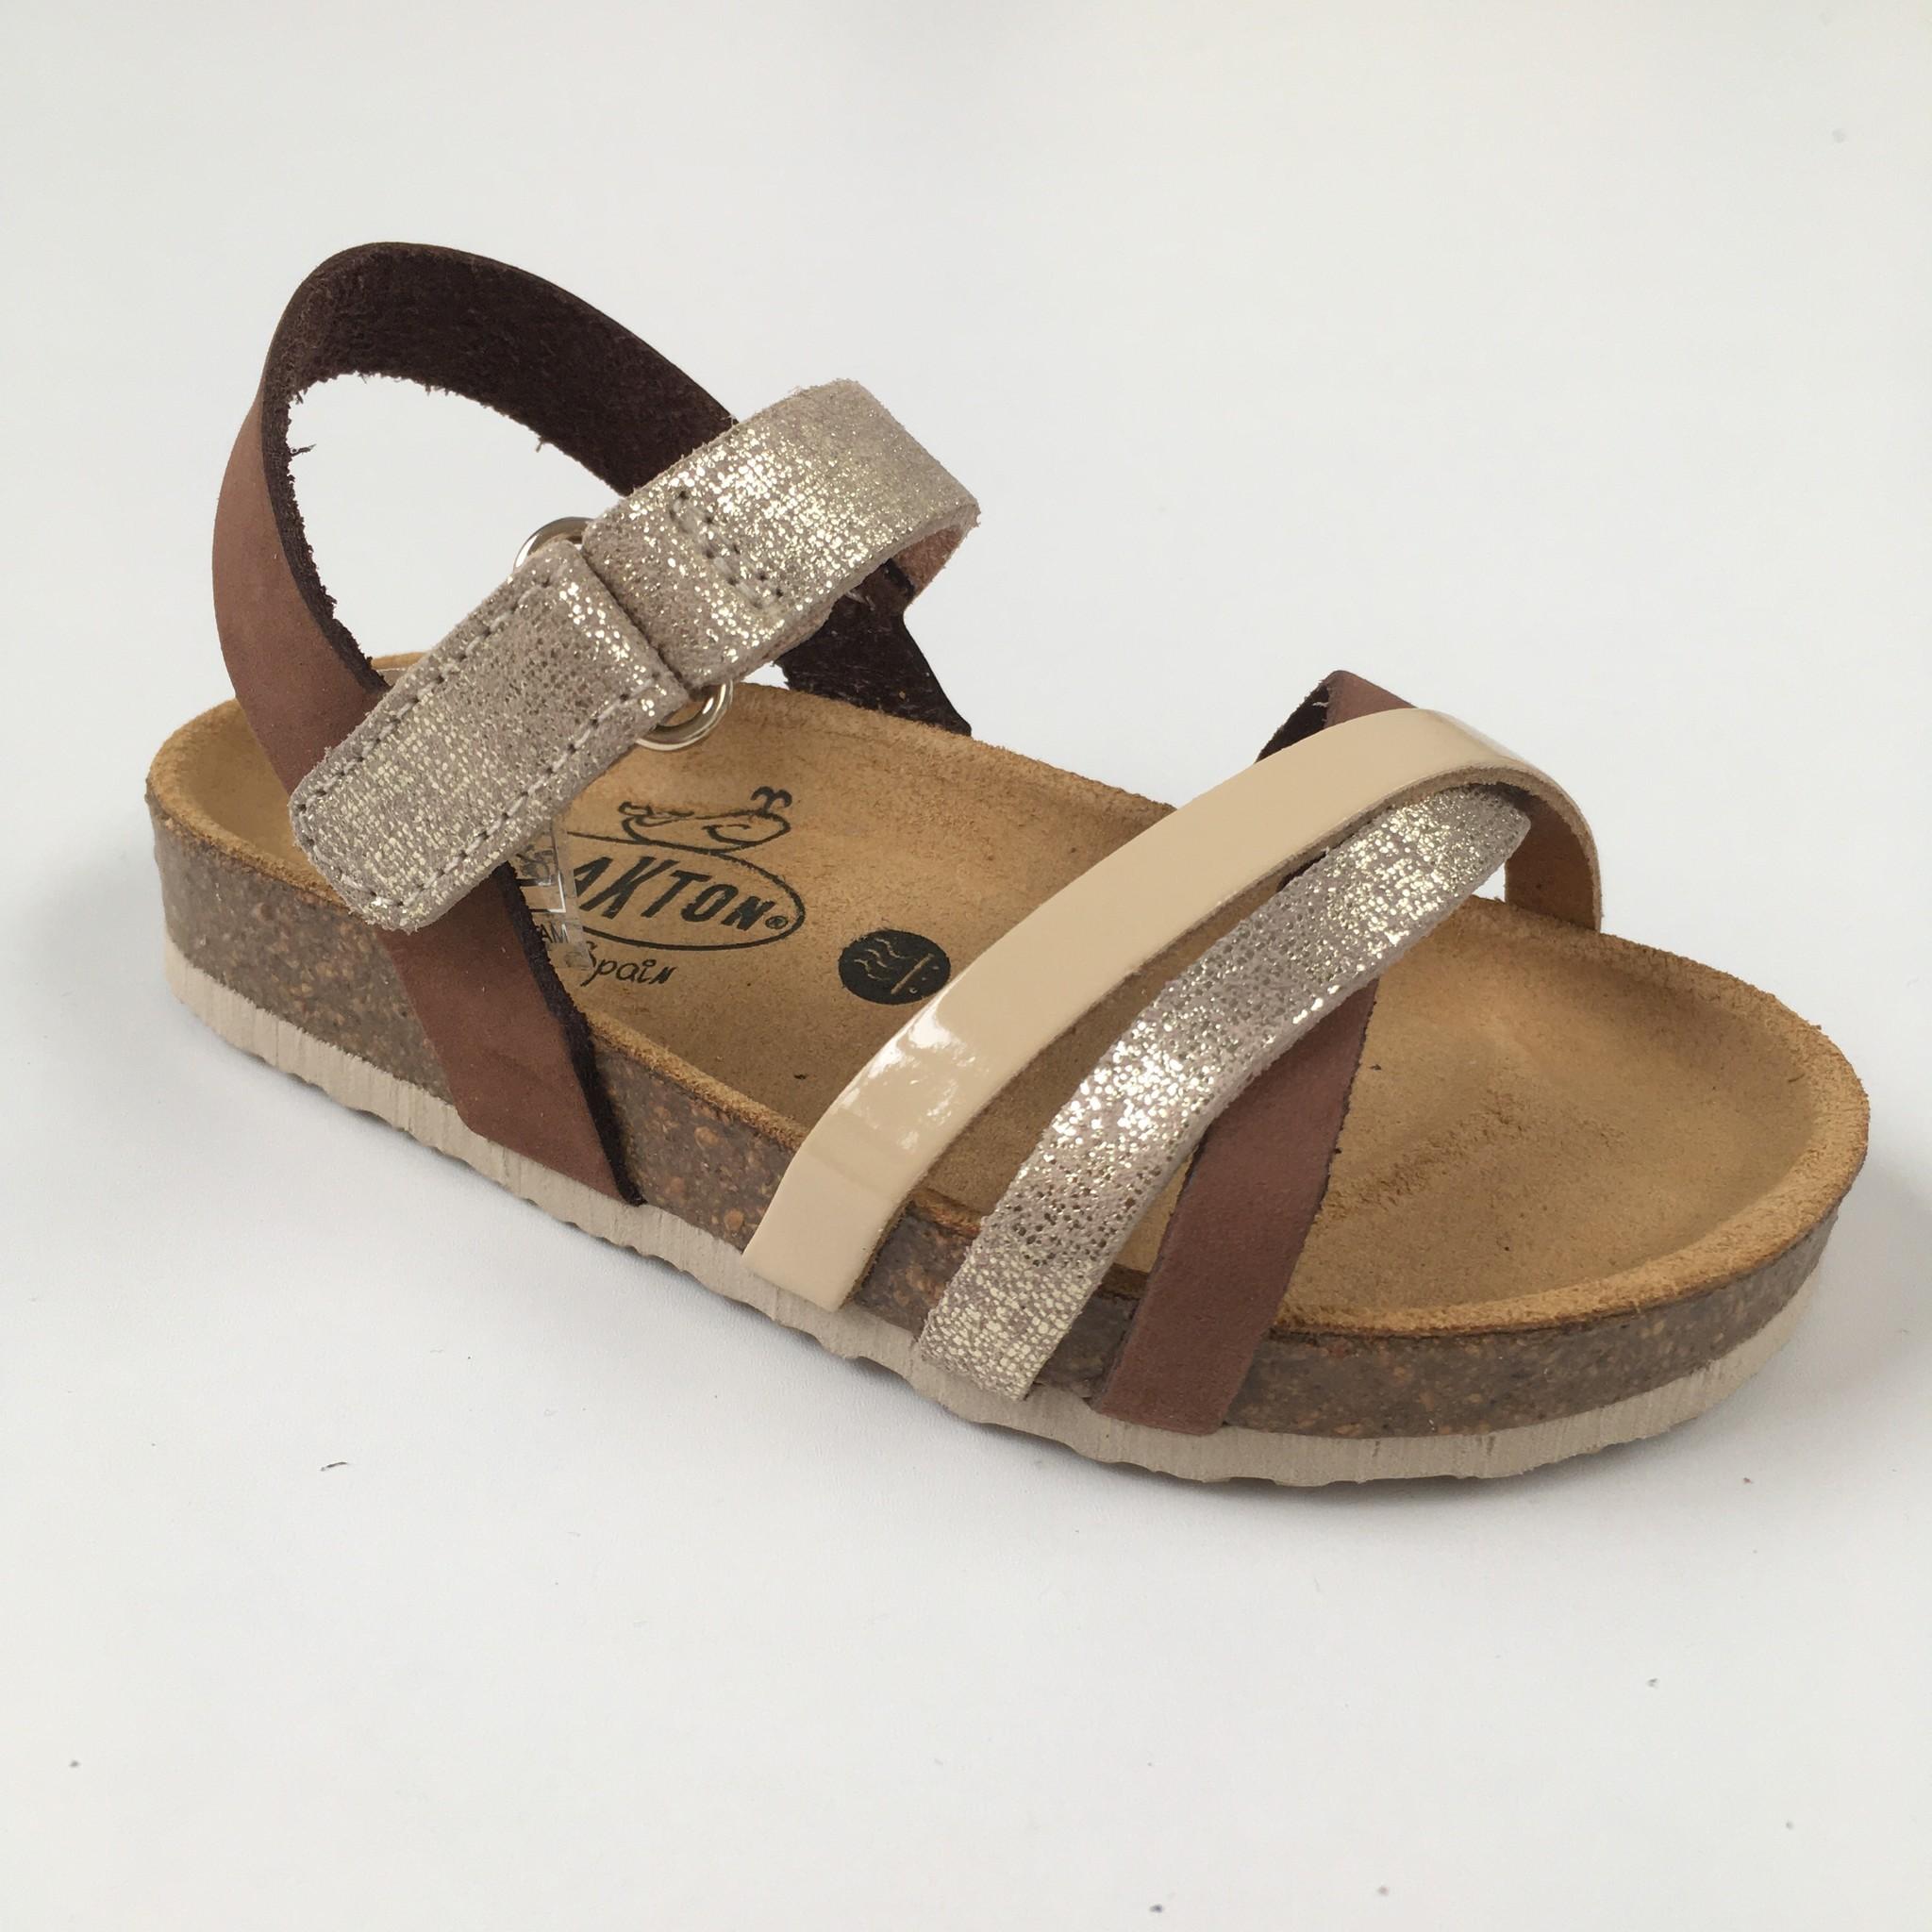 PLAKTON SANDALS leather cork sandal child SOFIA - silver / mokka / beige - 24 to 35